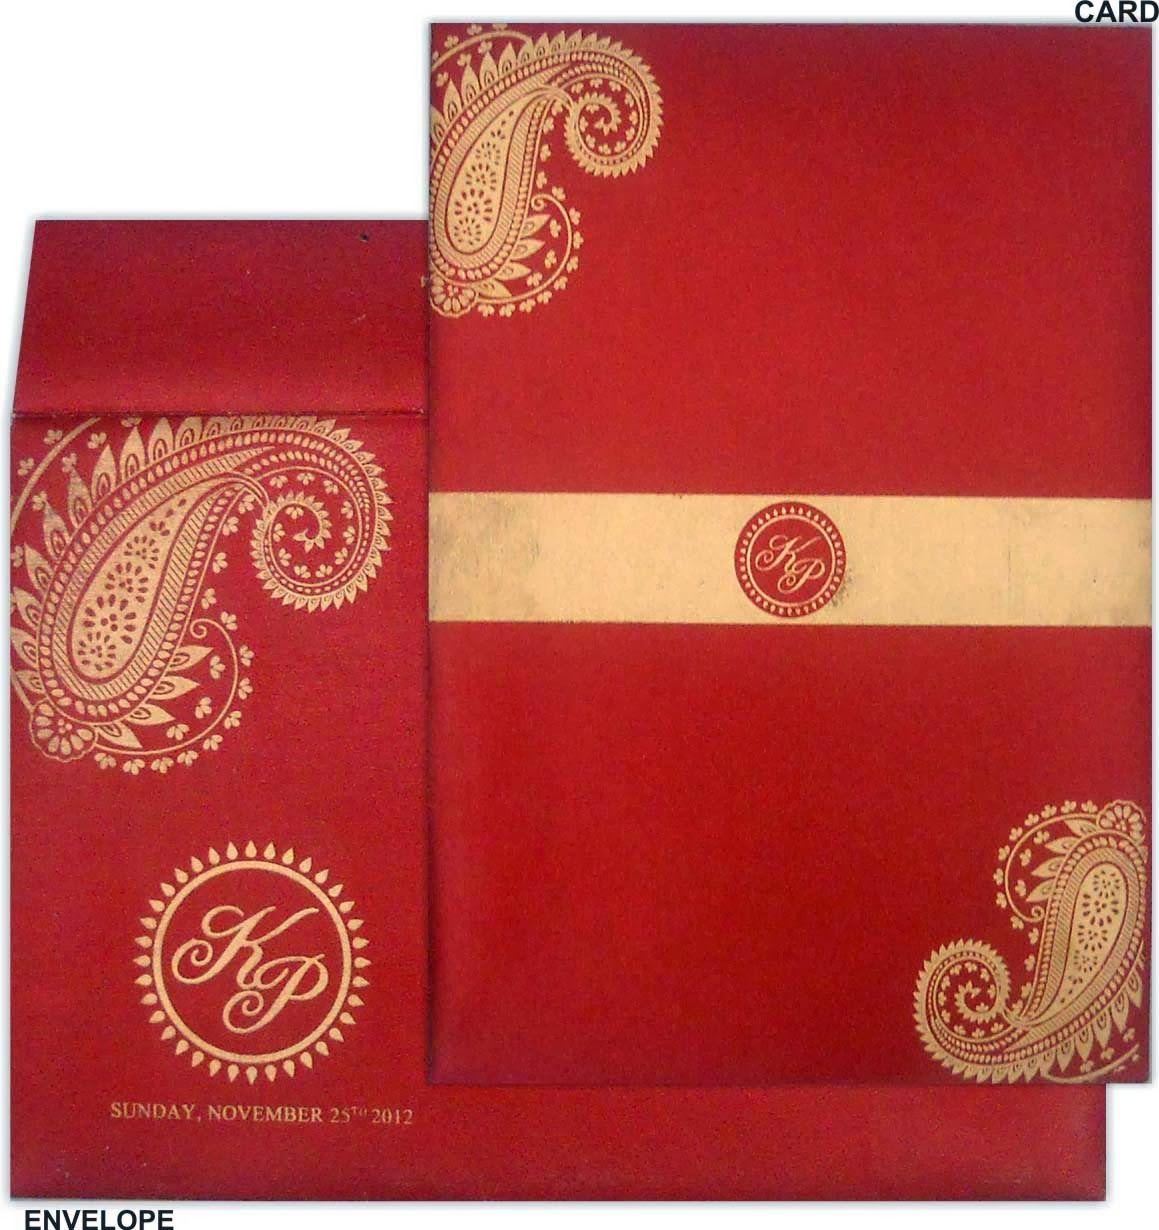 Indian Wedding Cards | Indian Wedding Cards | Pinterest | Wedding ...